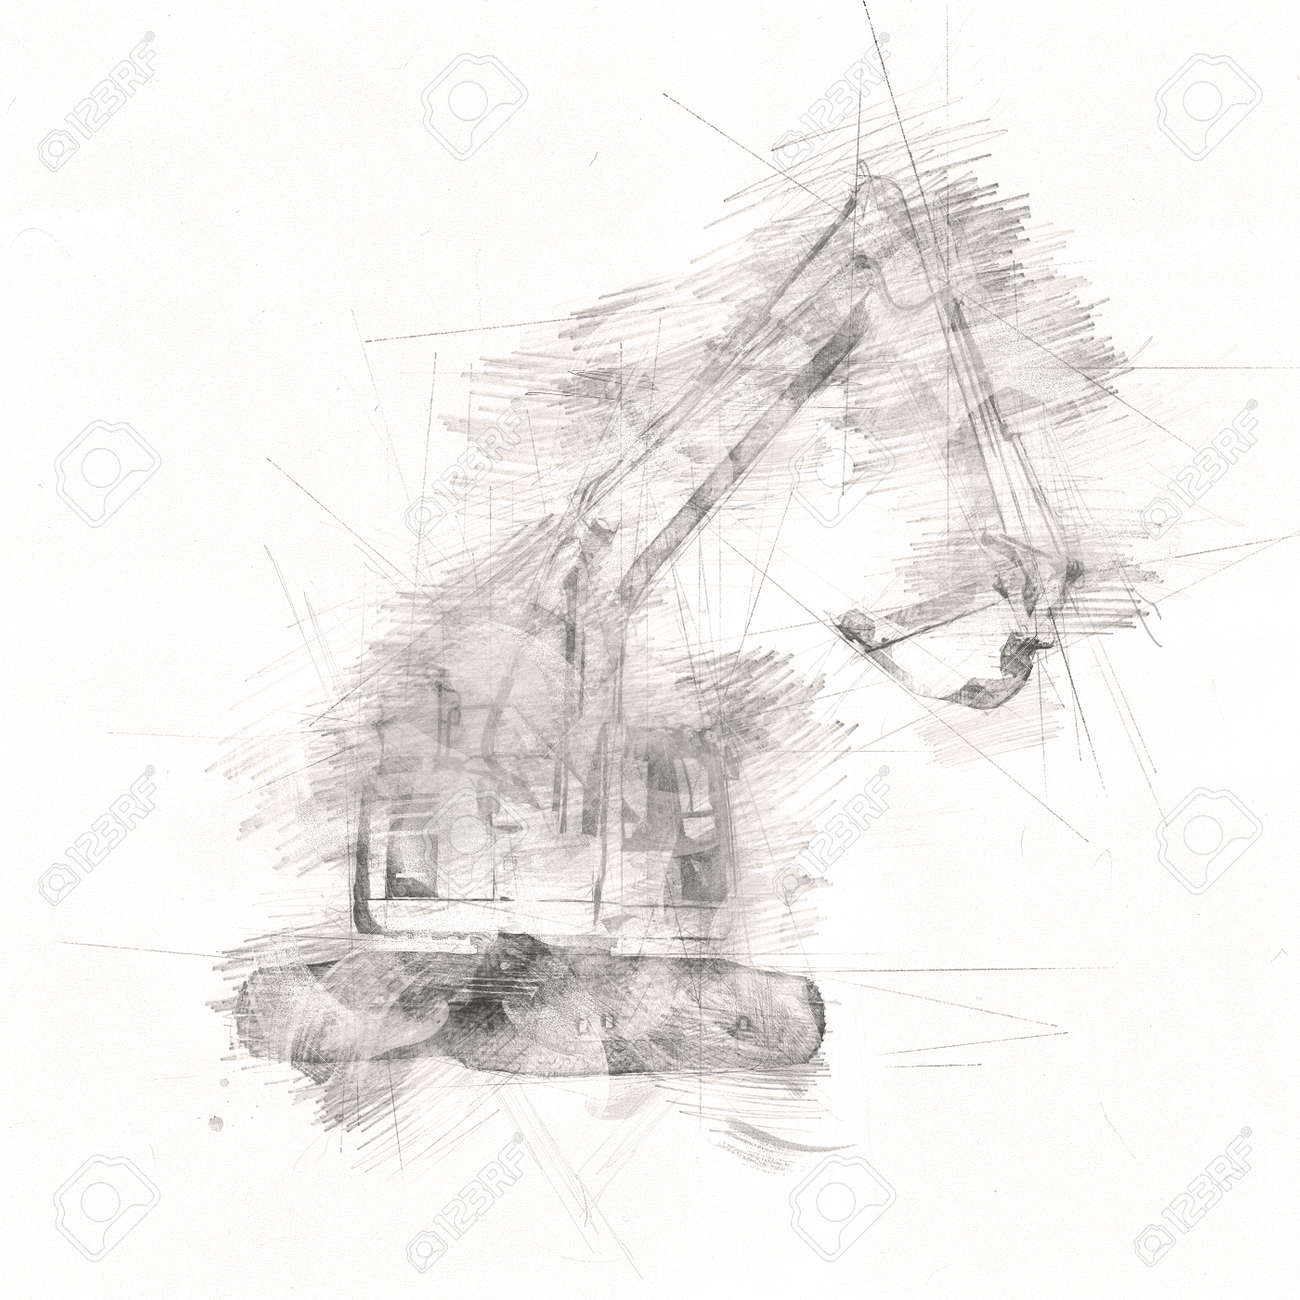 Excavator isolated art work - 143203890